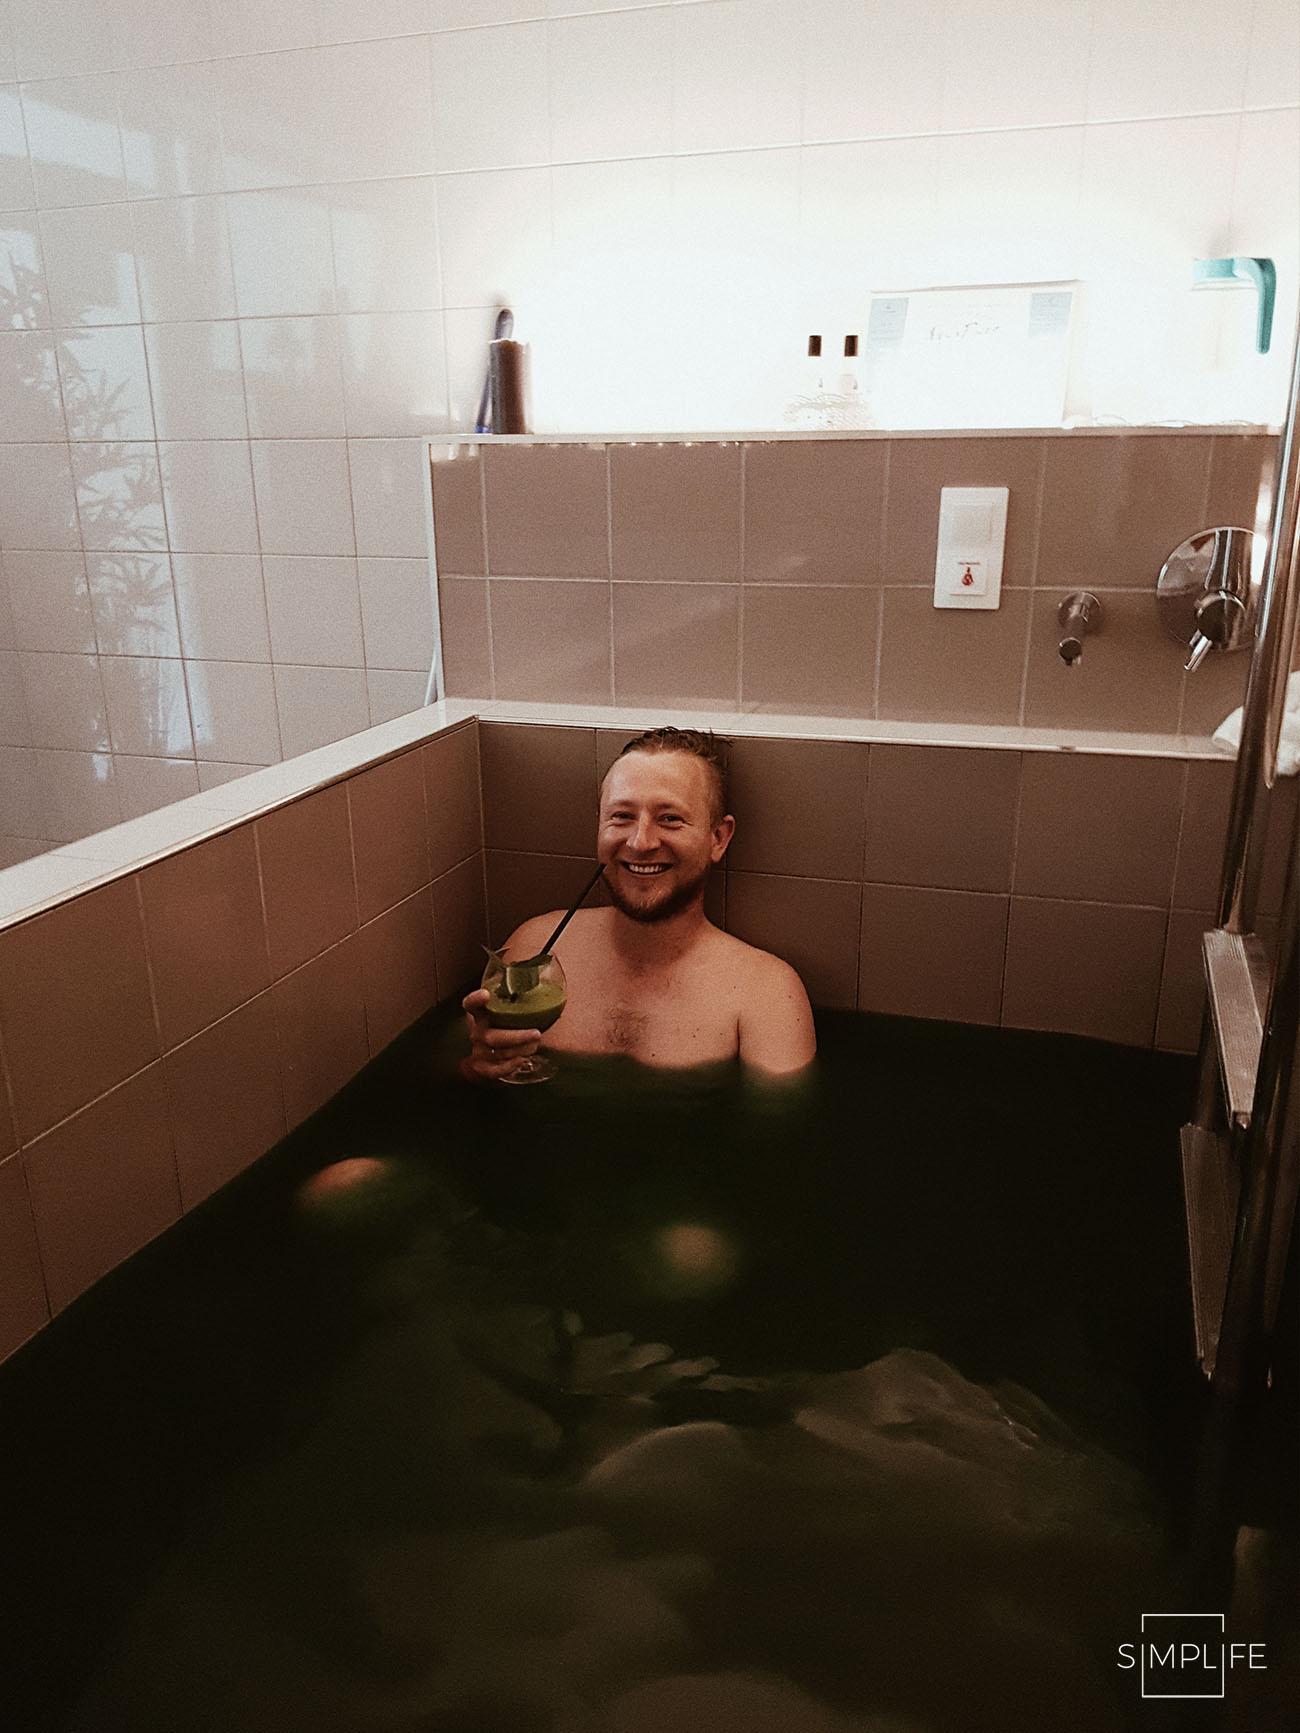 kąpiele solankowe